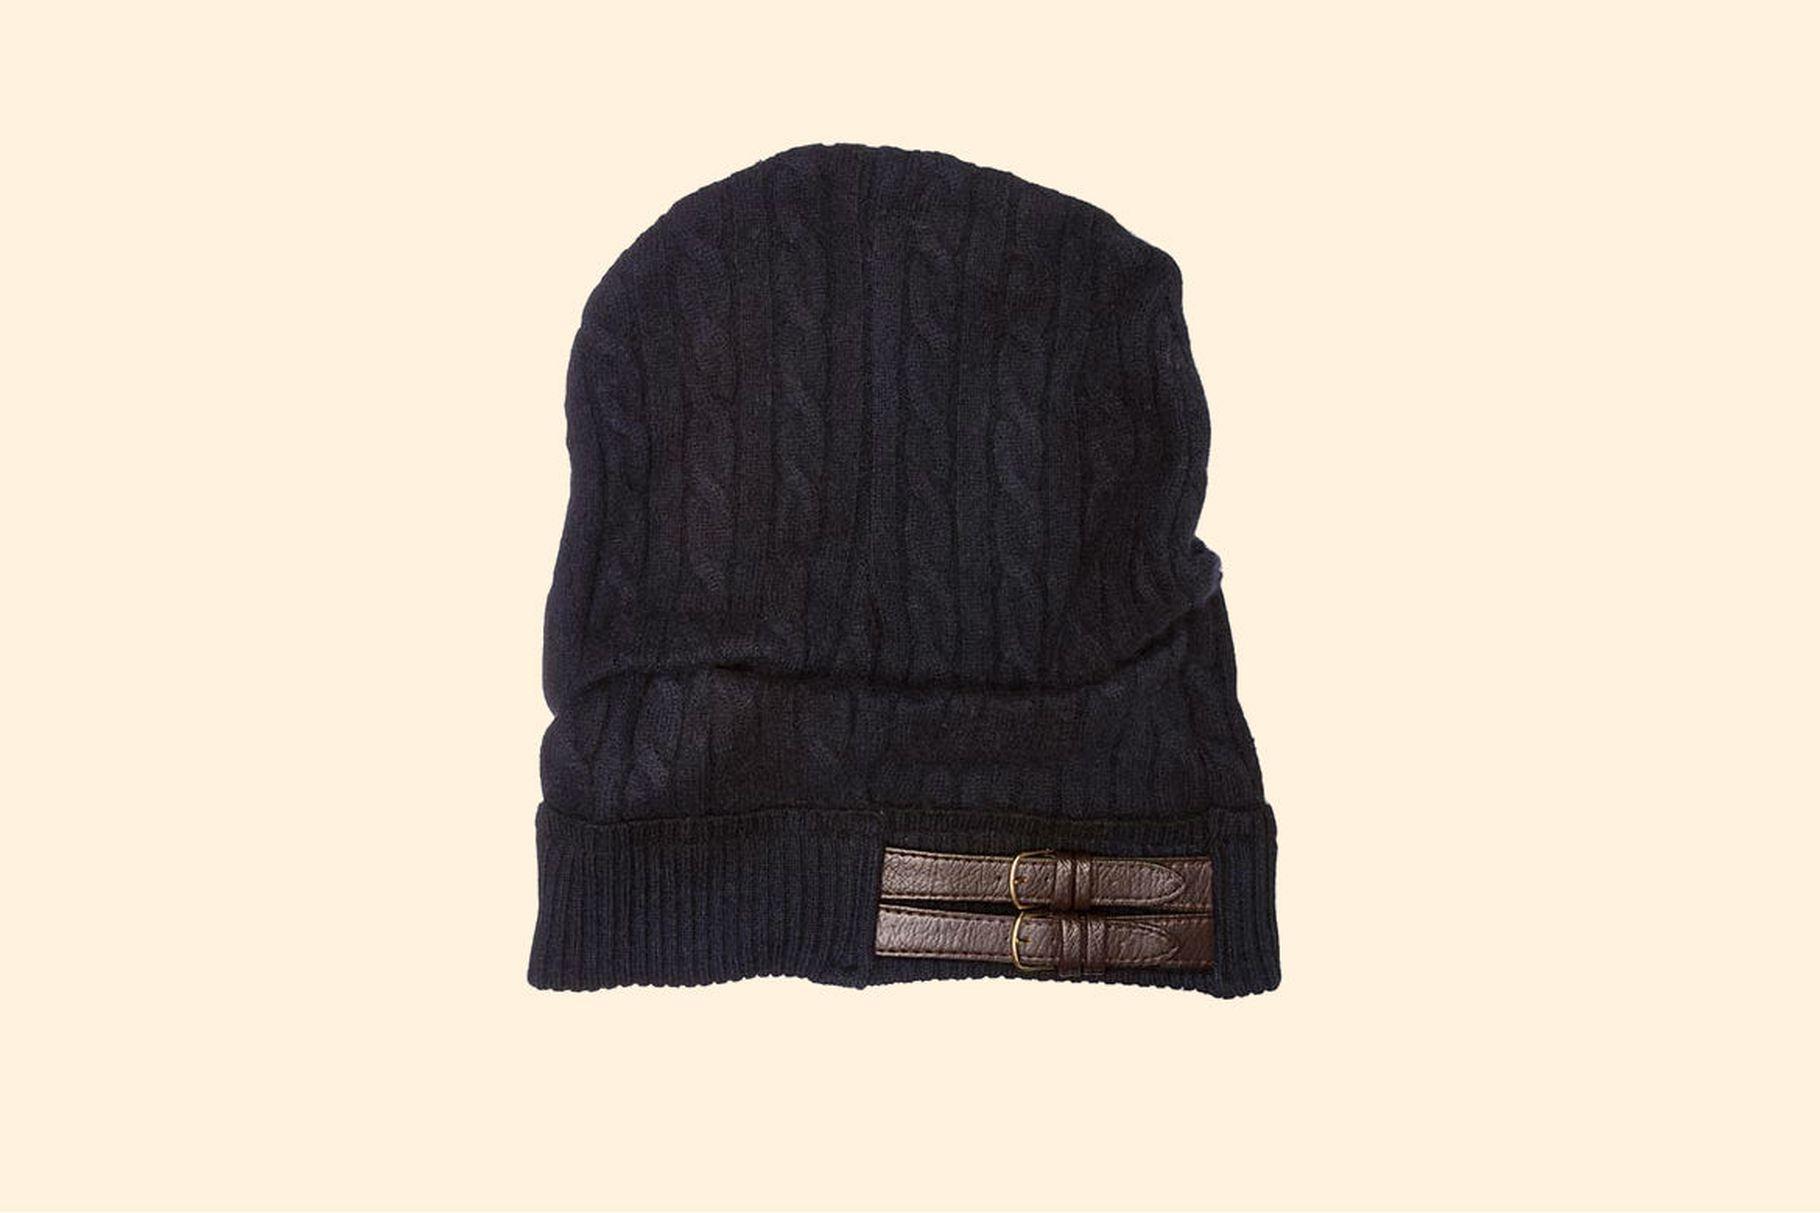 expensive-hat.jpg